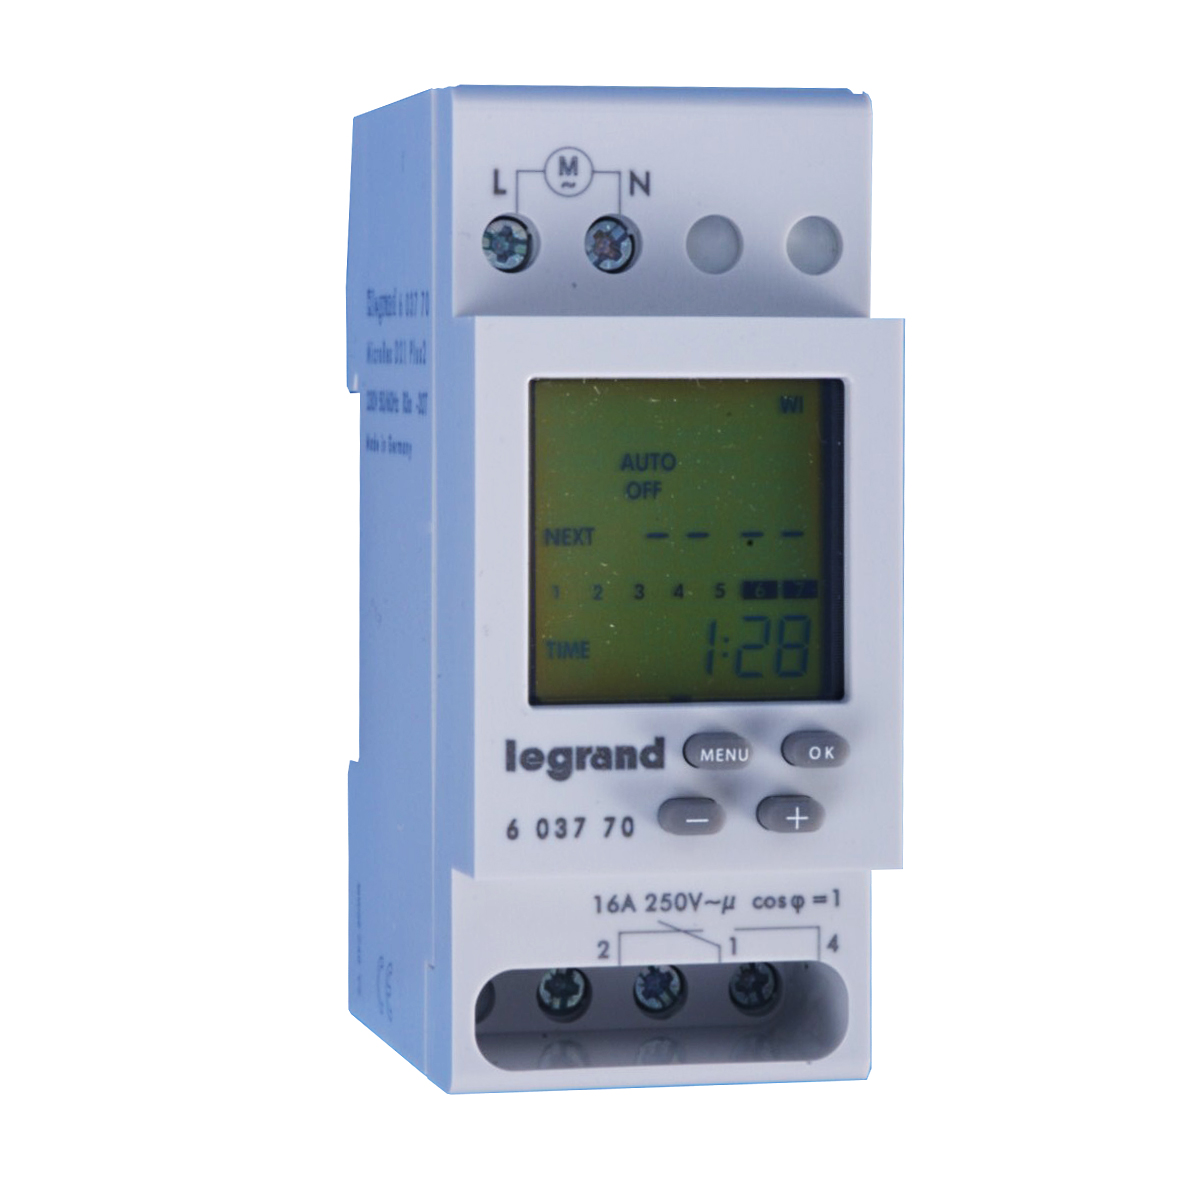 LEGRAND MICROREX D21 Plus 2 นาฬิกาตั้งเวลาแบบดิจิตอล